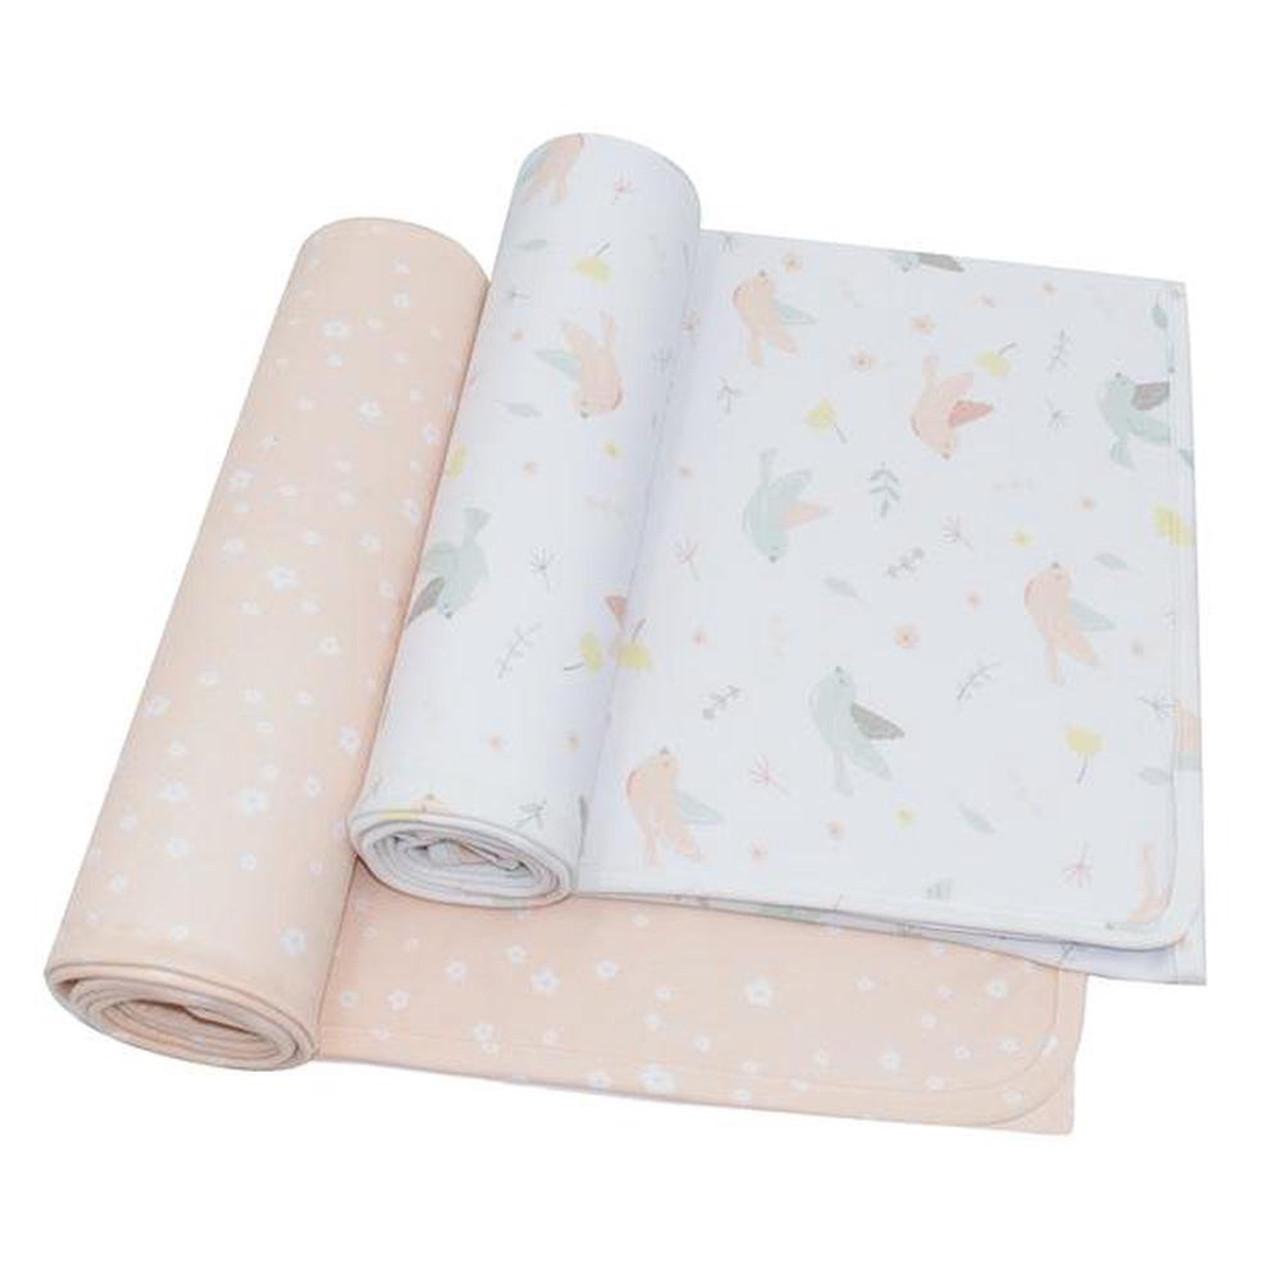 Living Textiles Jersey Wrap 2pk AVA BLUSH FLORAL